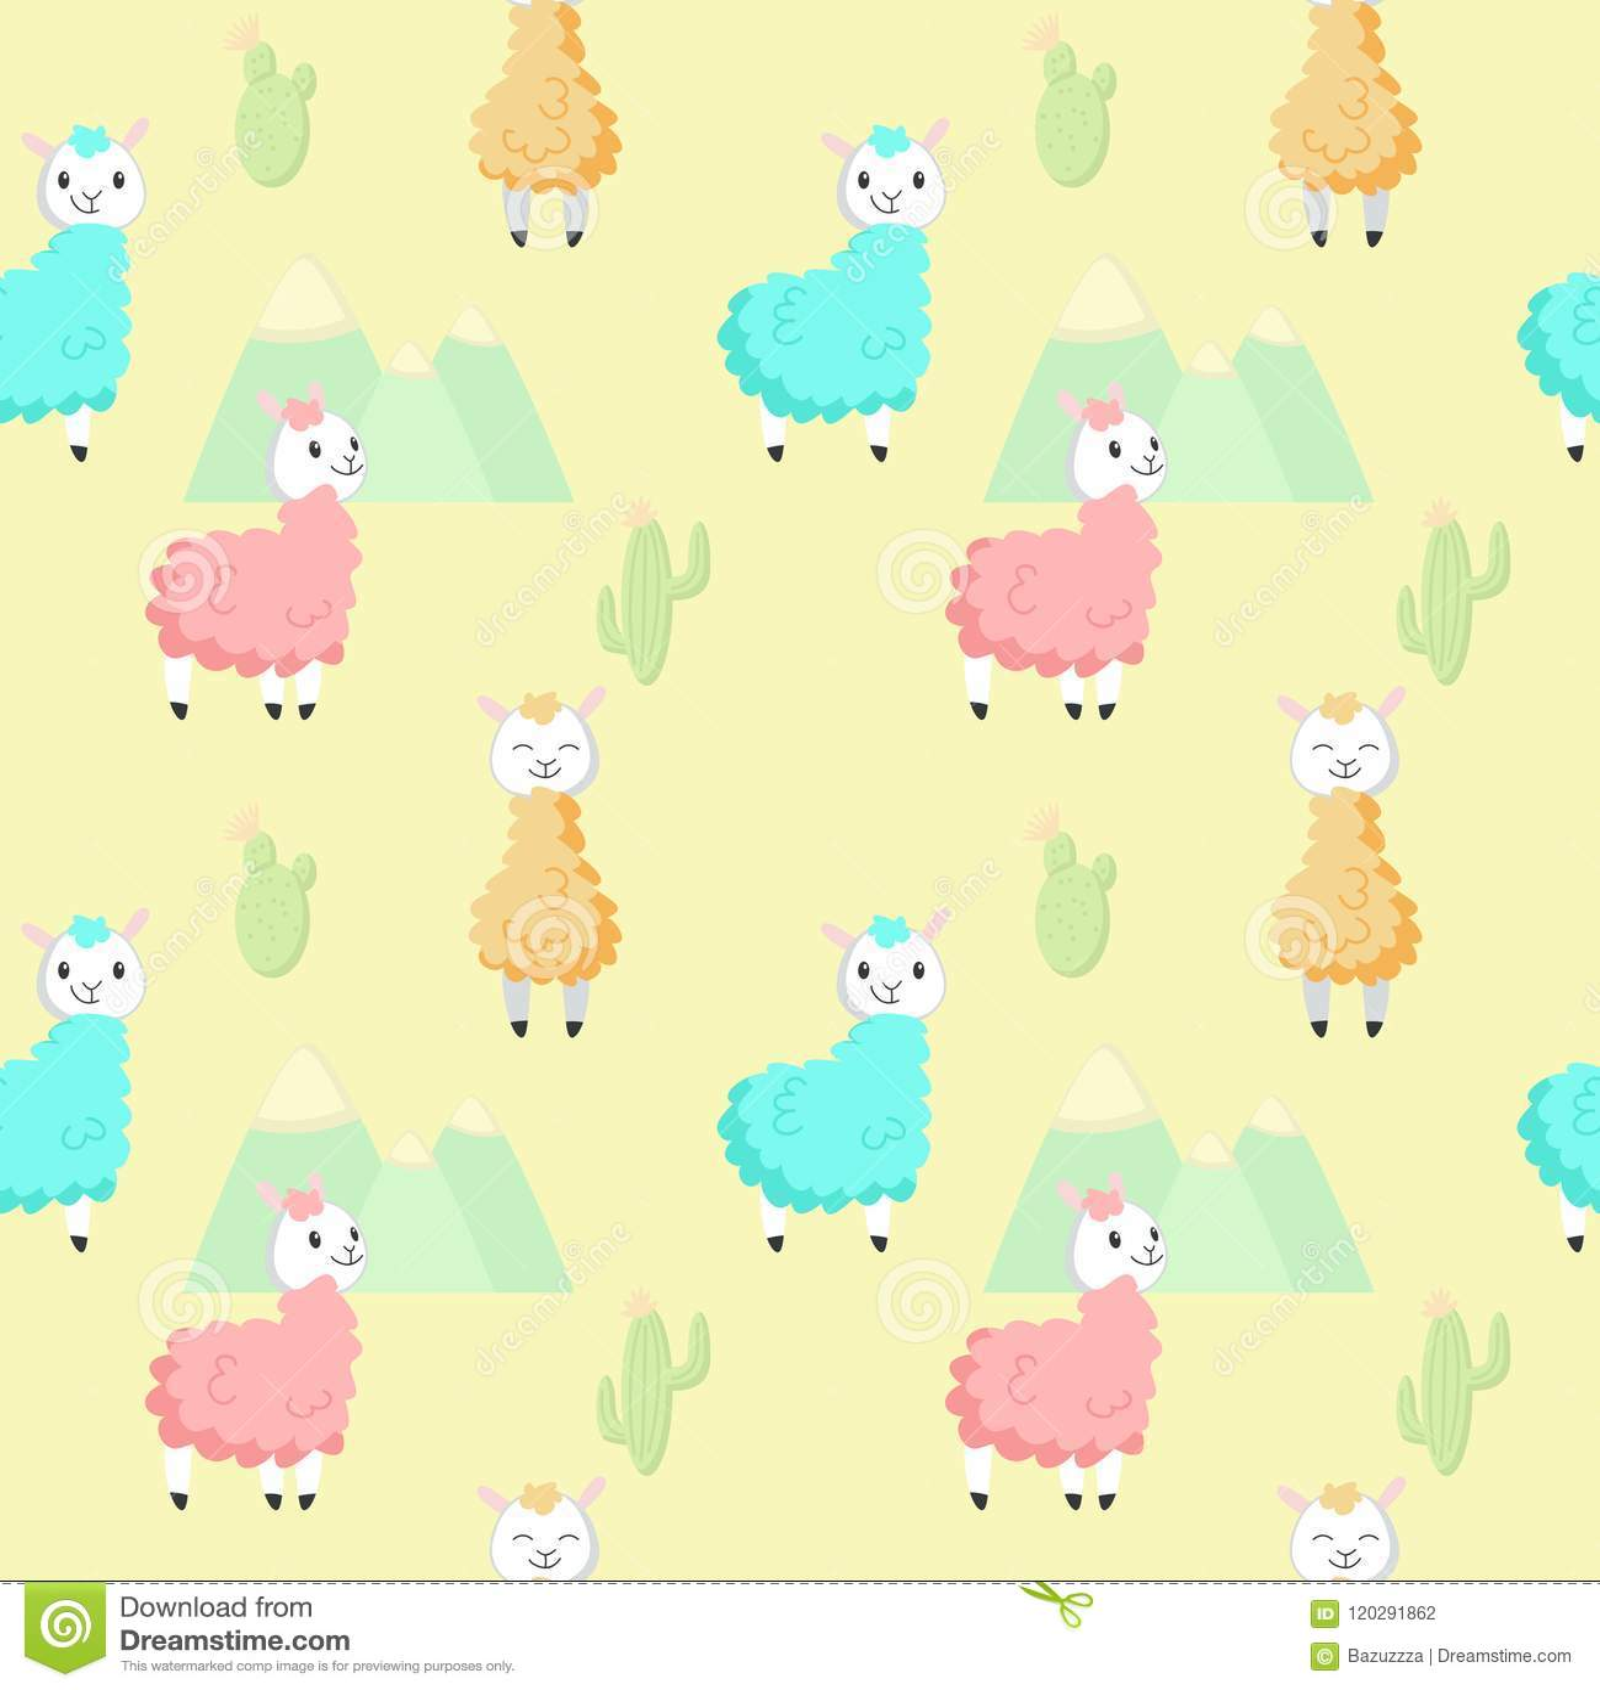 Cute Alpaca With Cactus Vector Seamless Pattern Stock Vector